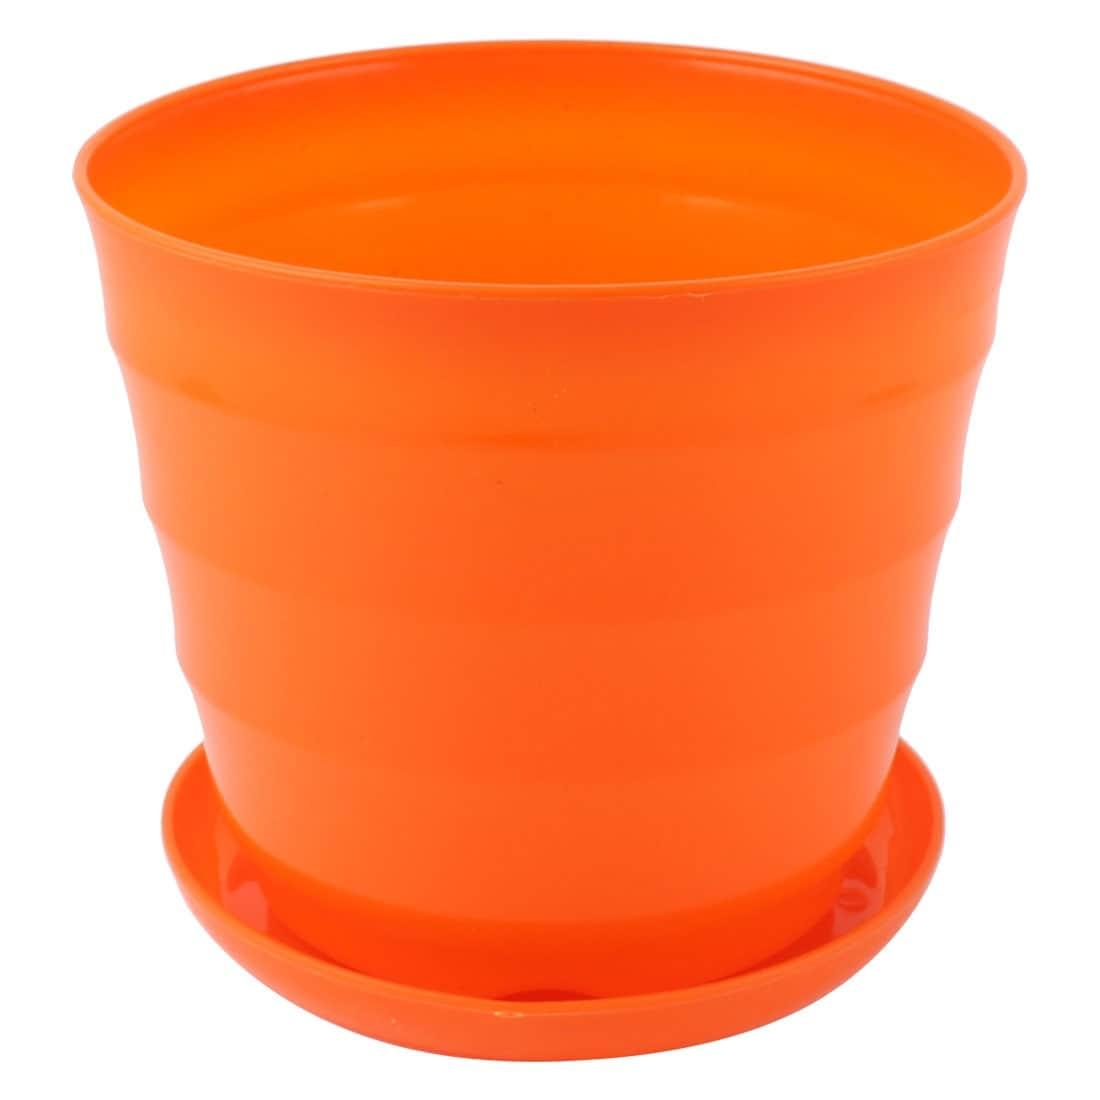 Buy Orange Planters & Plant Stands Online at Overstock   Our Best Outdoor Decor Deals